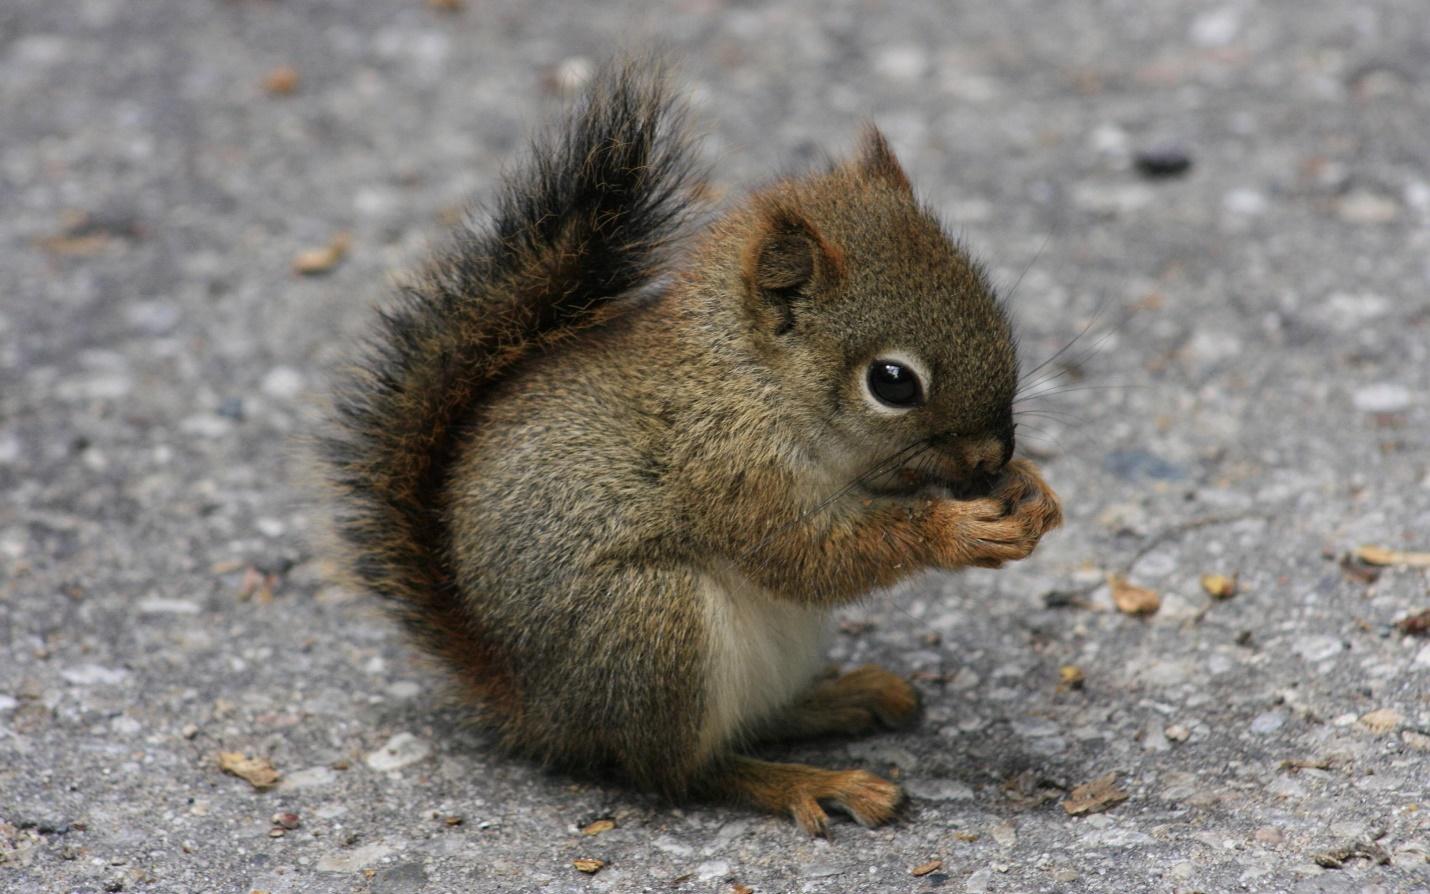 C:\Users\лд\AppData\Local\Microsoft\Windows\INetCache\Content.Word\squirrel-04.jpg